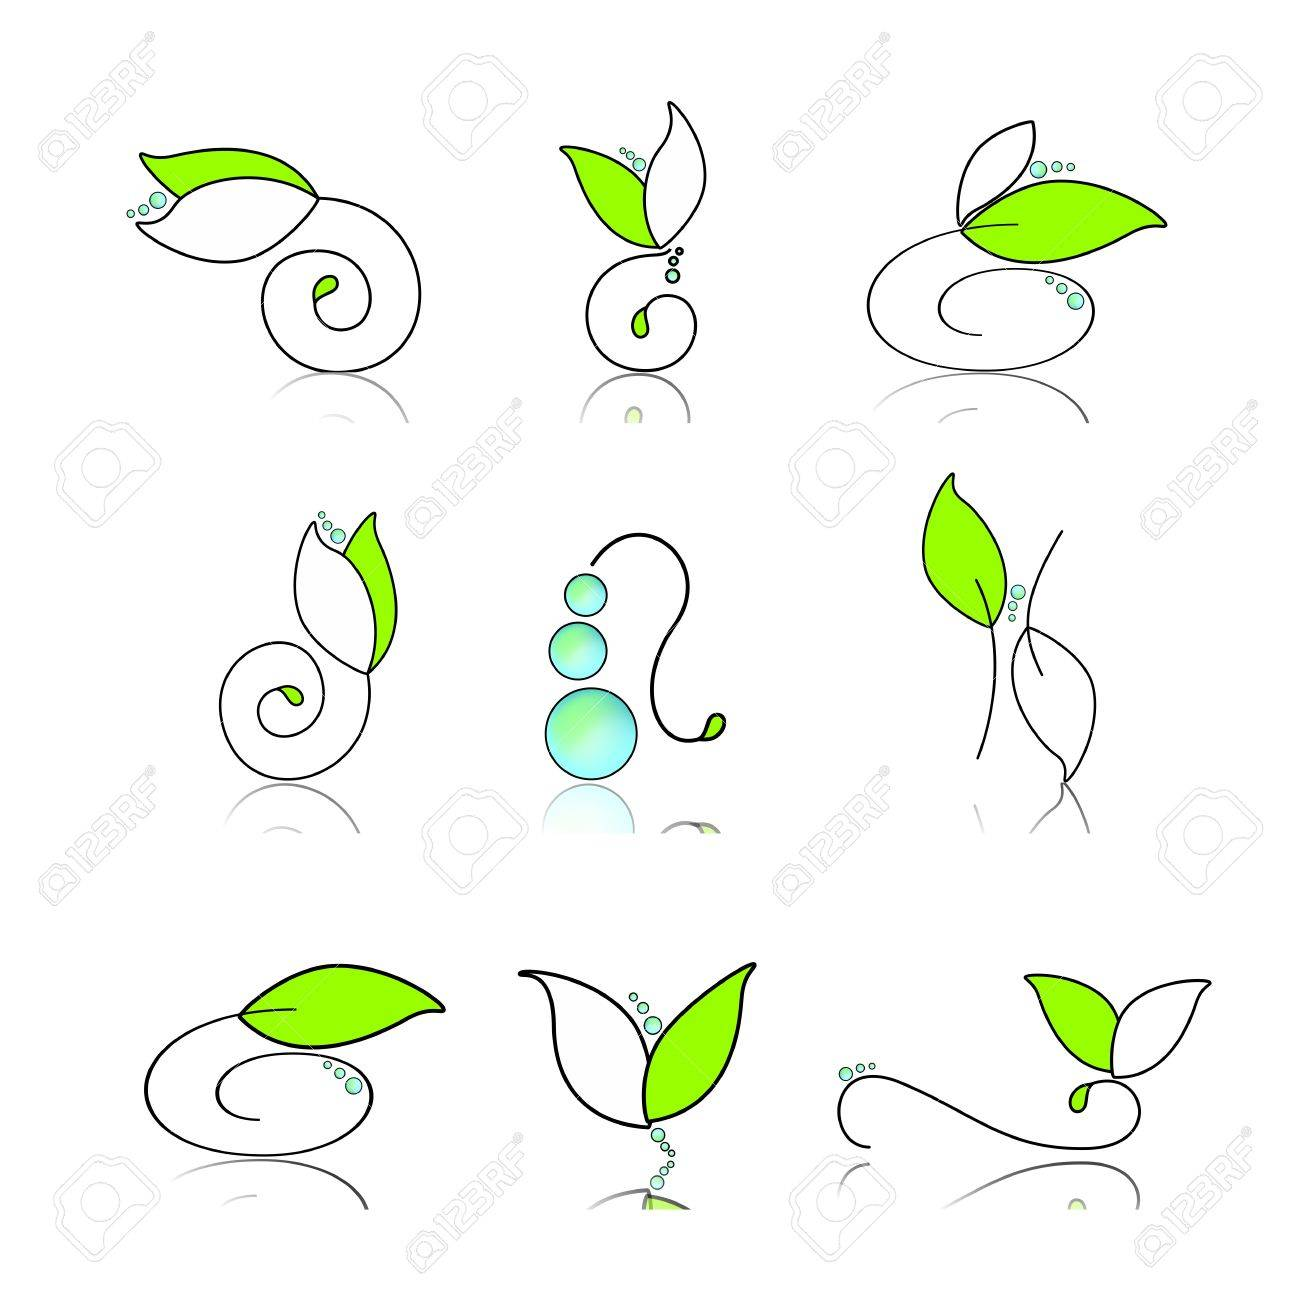 Flowers Stock Vector - 12467418